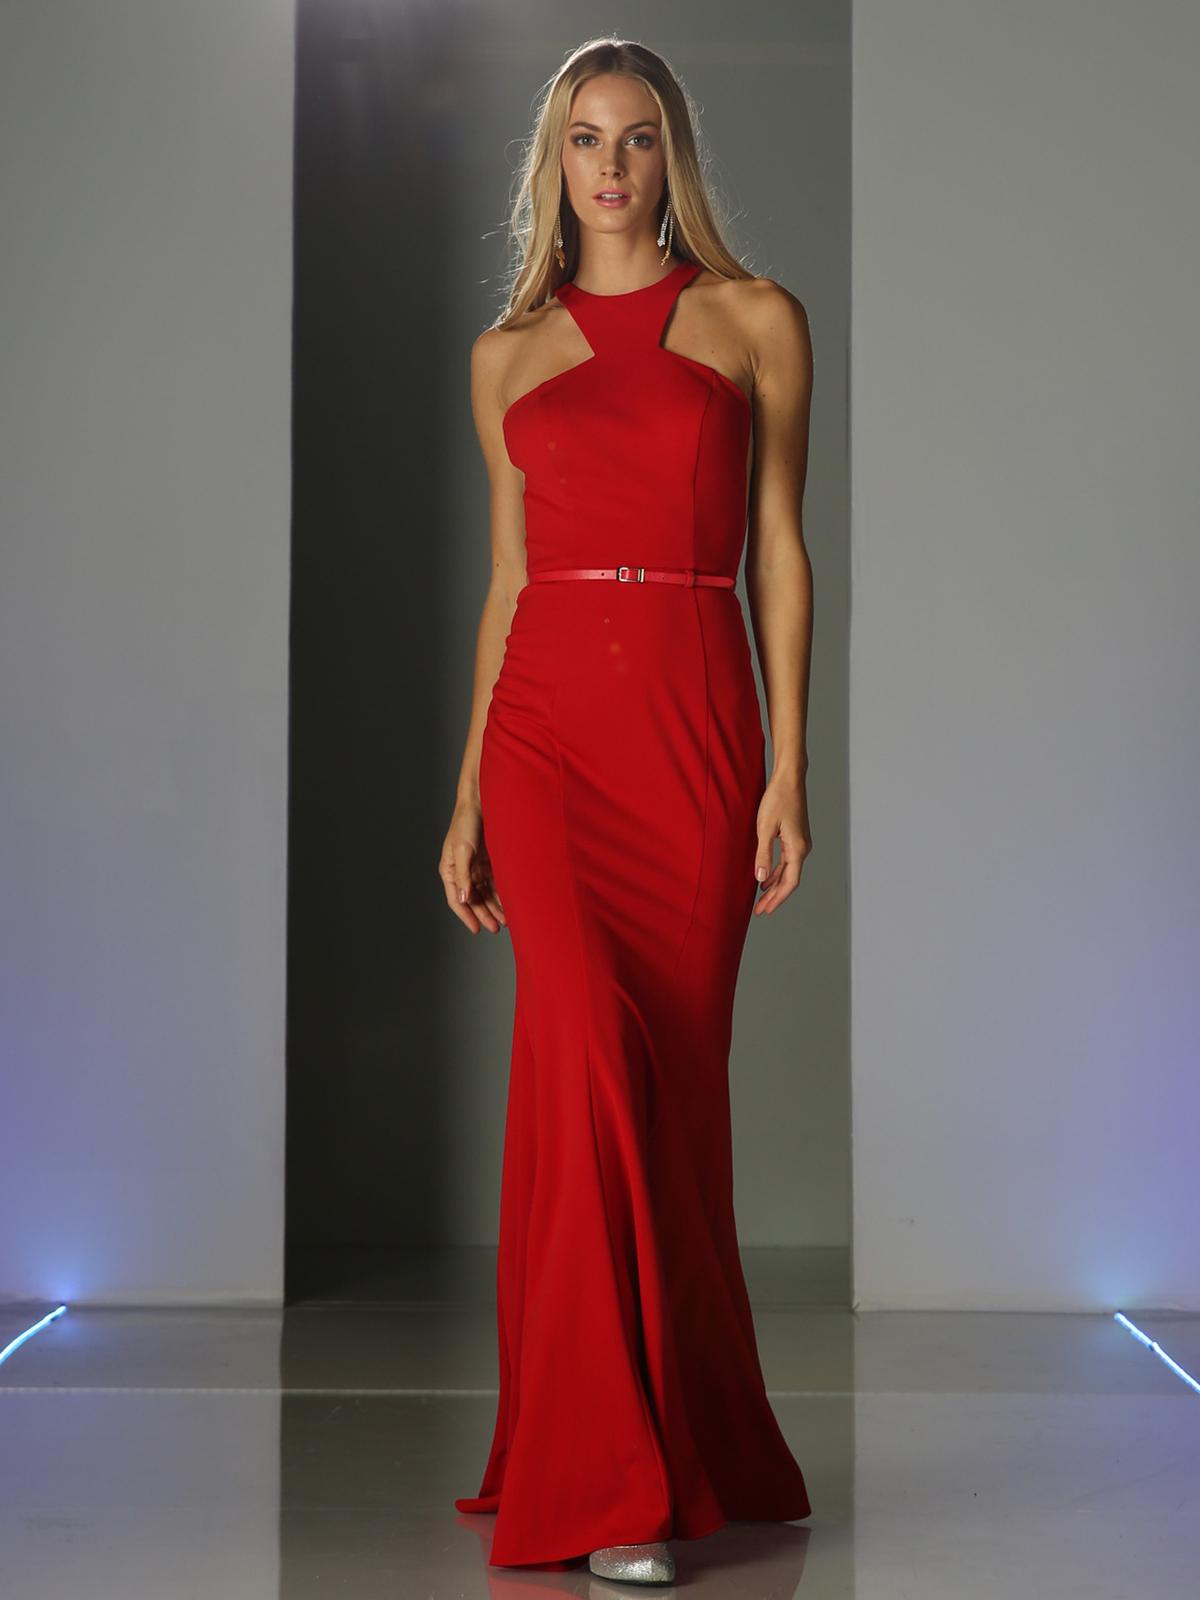 Halter Cut Out Prom Evening Dress Sung Boutique L A